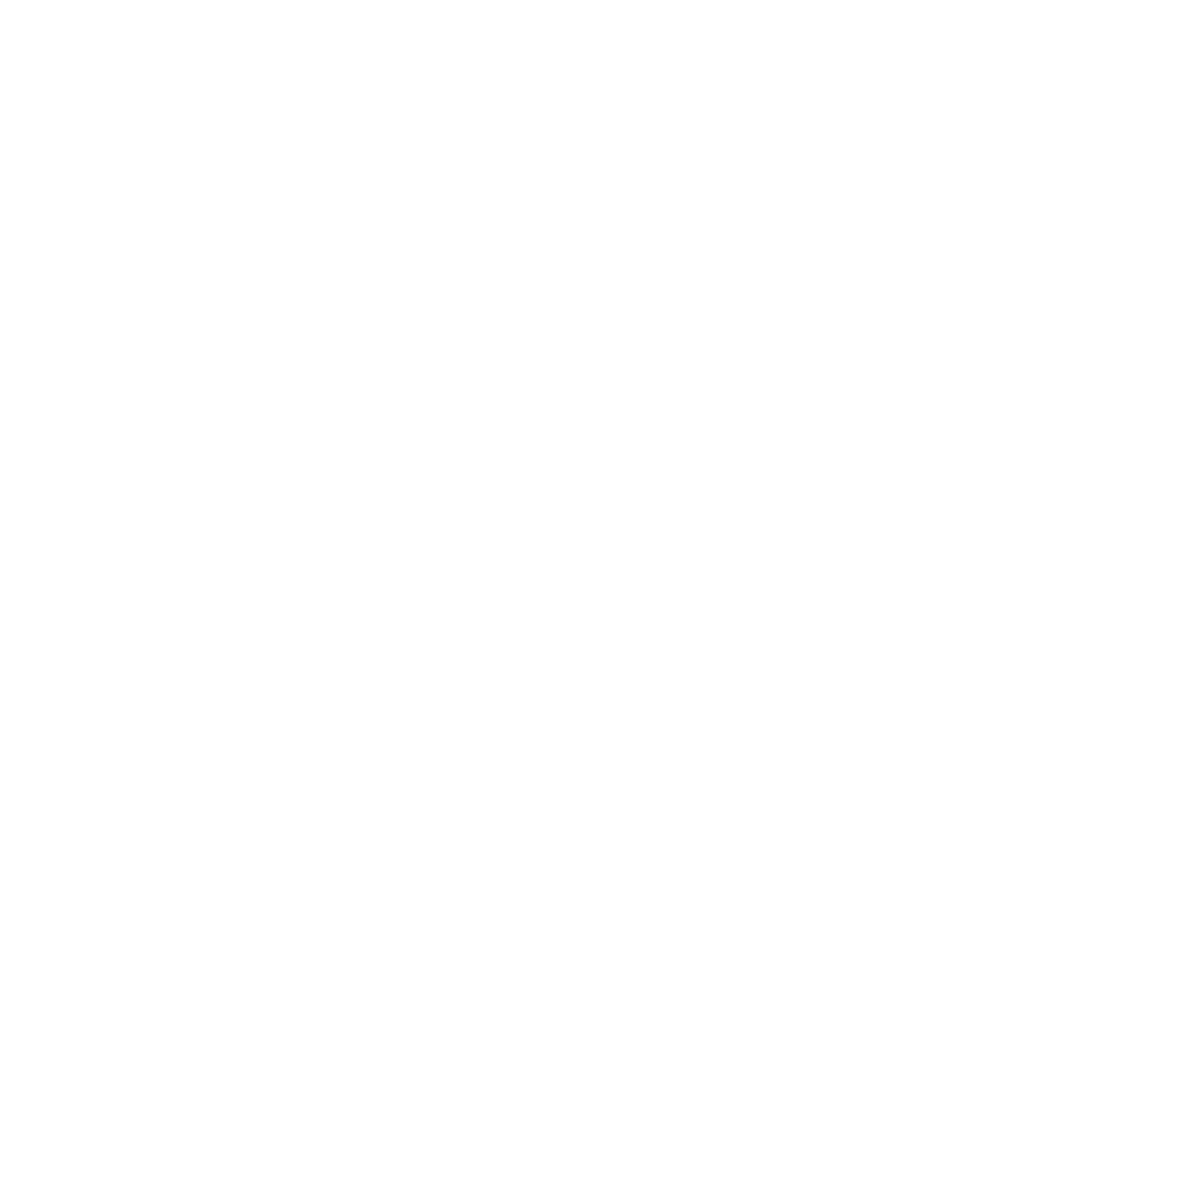 Autolign Inspections